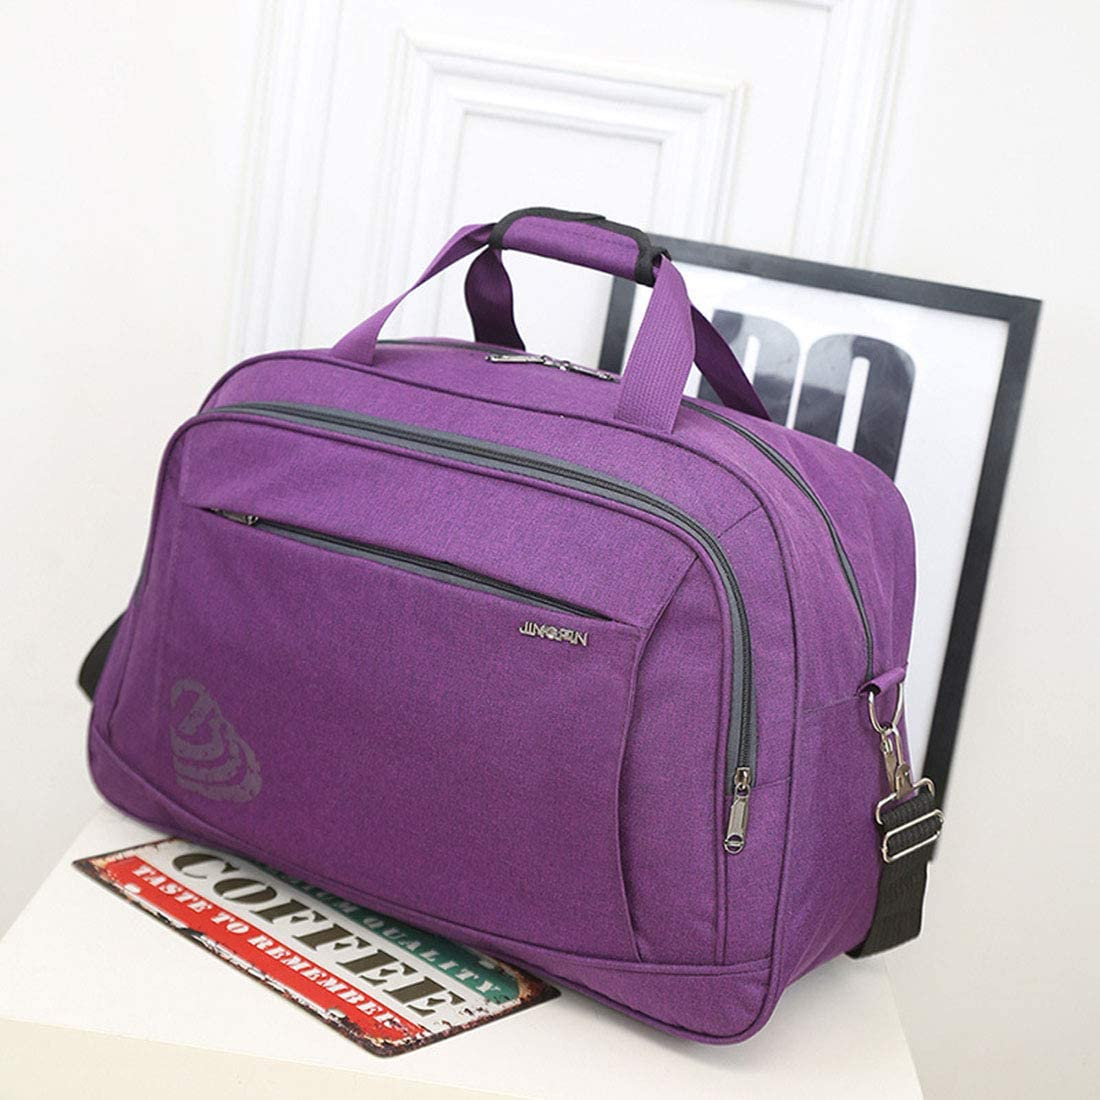 Color : Purple, Size : L AIYAMAYA Nylon Travel Bag Shoulder Diagonal Travel Bag Hand Bag Waterproof Handbag Large Capacity Storage Bag